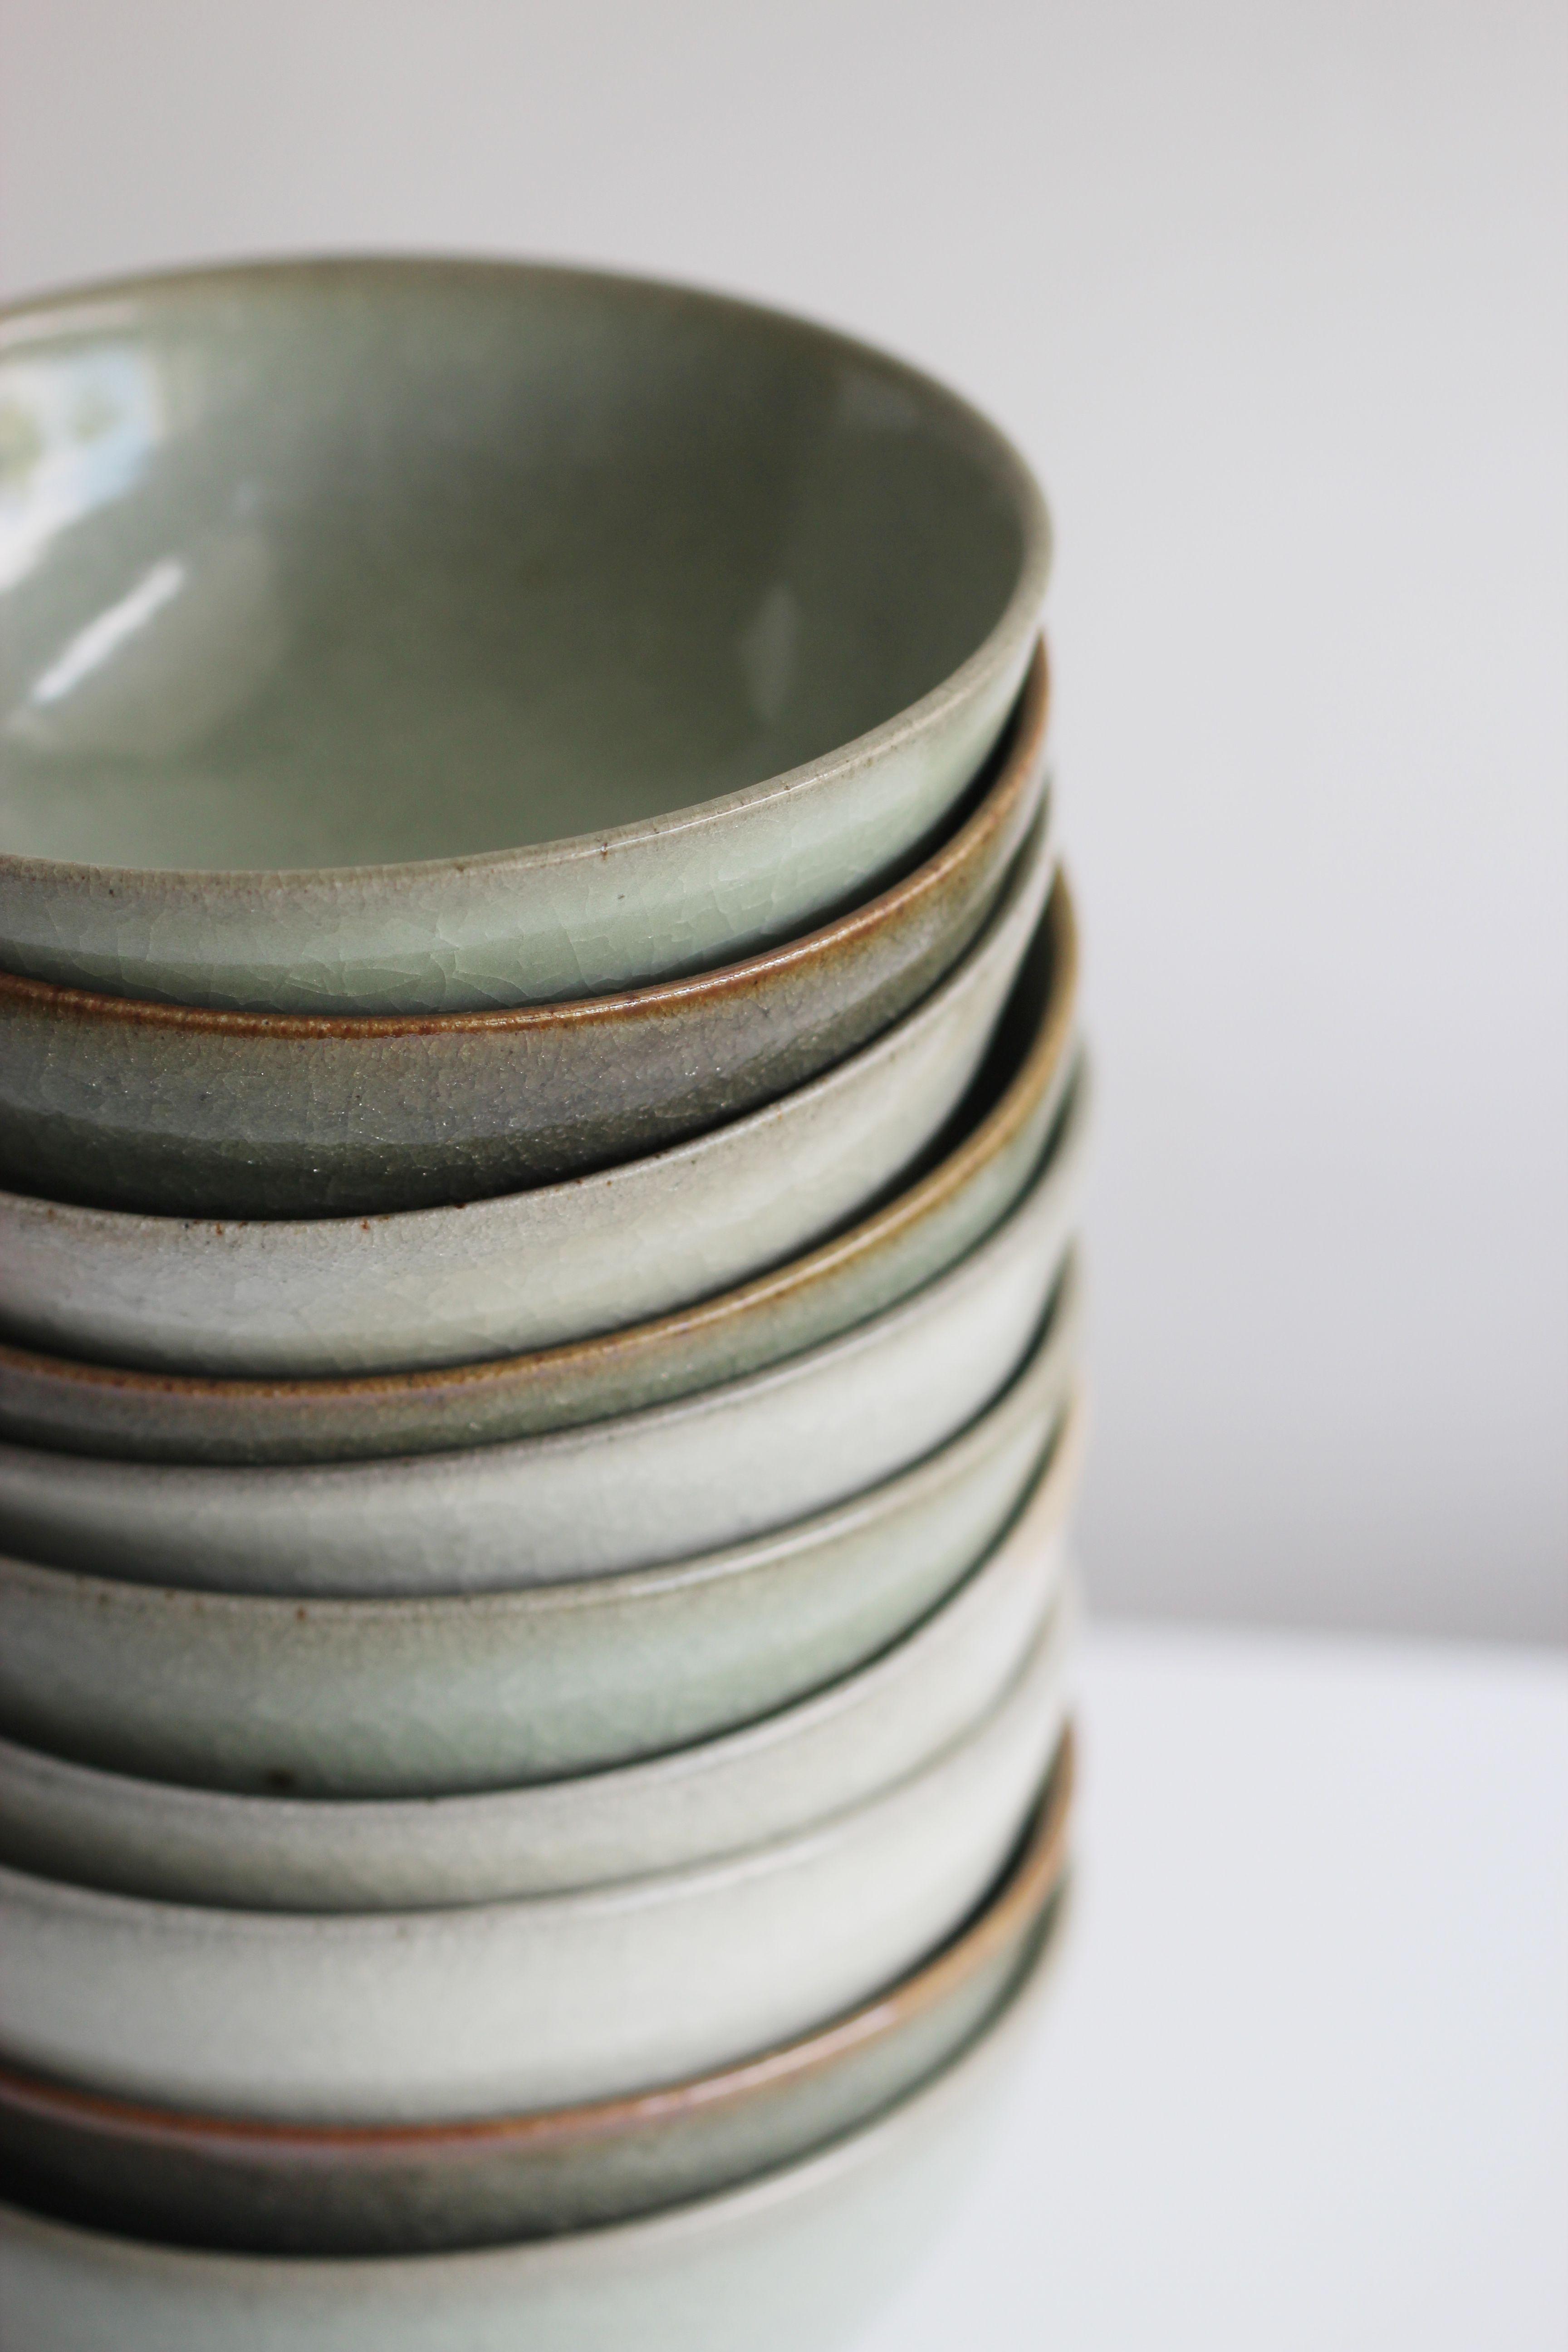 Florian Gadsby Ceramics Ceramics Pottery Crackle Glaze